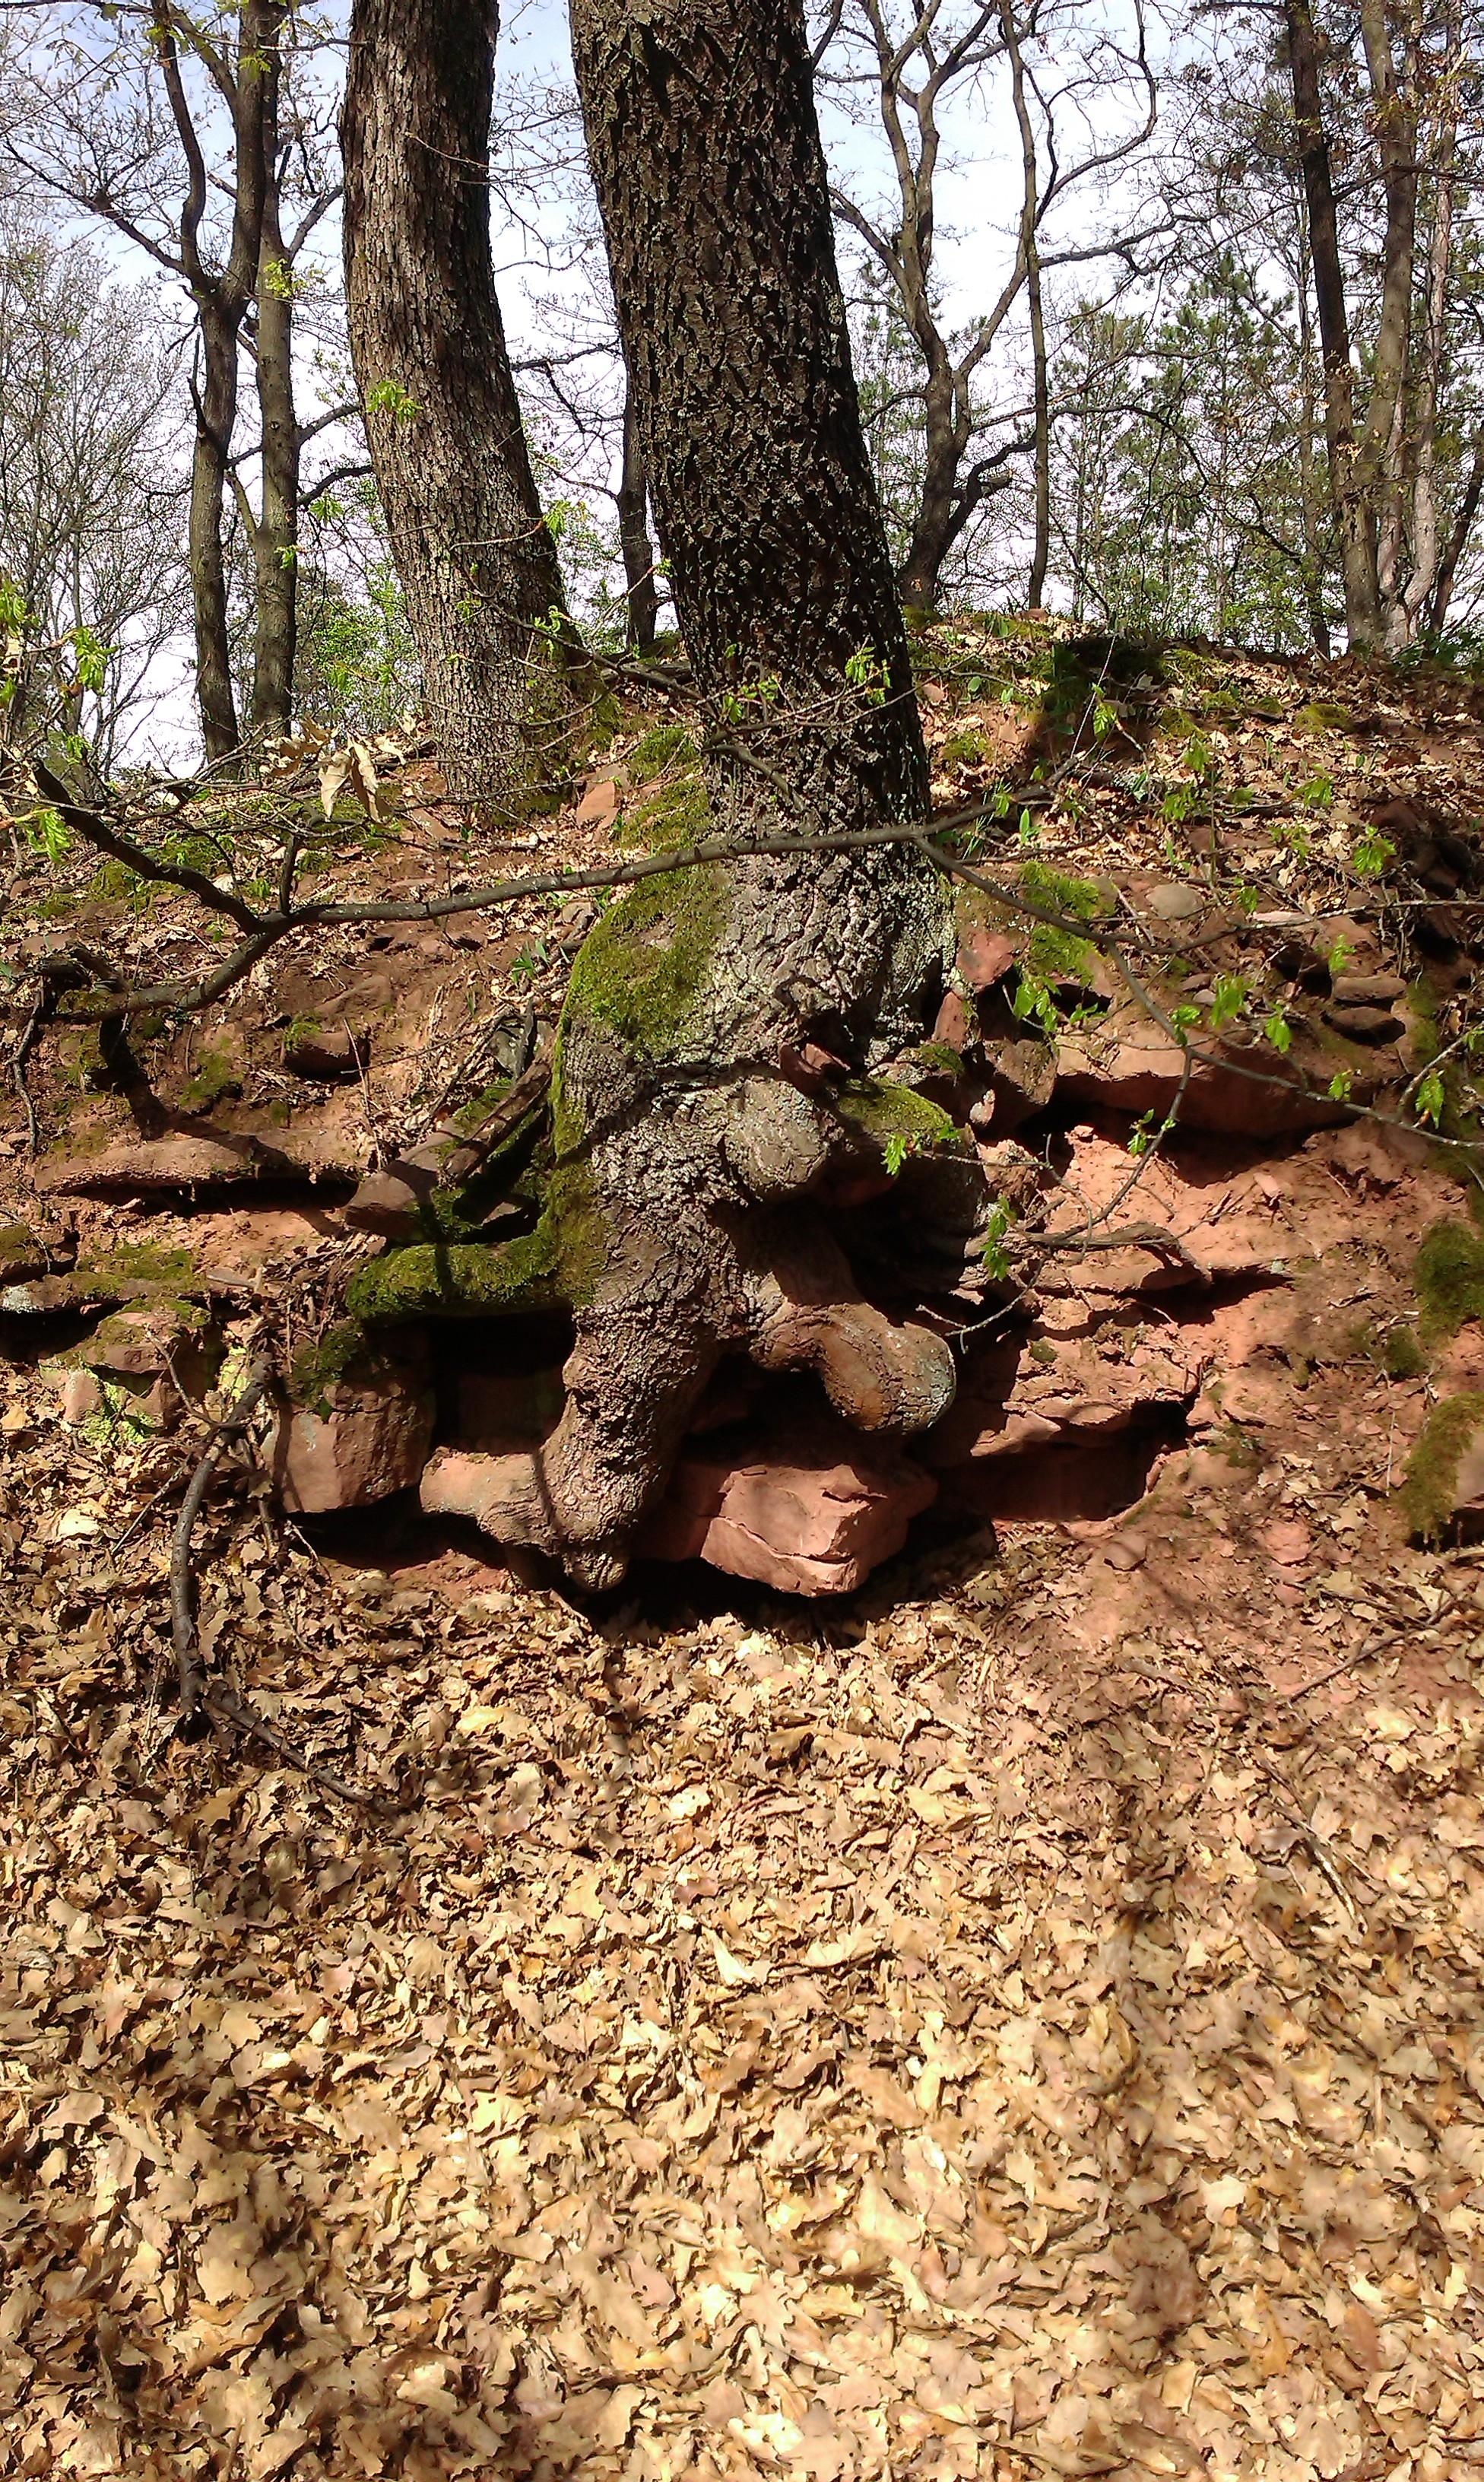 gyokerek kövek